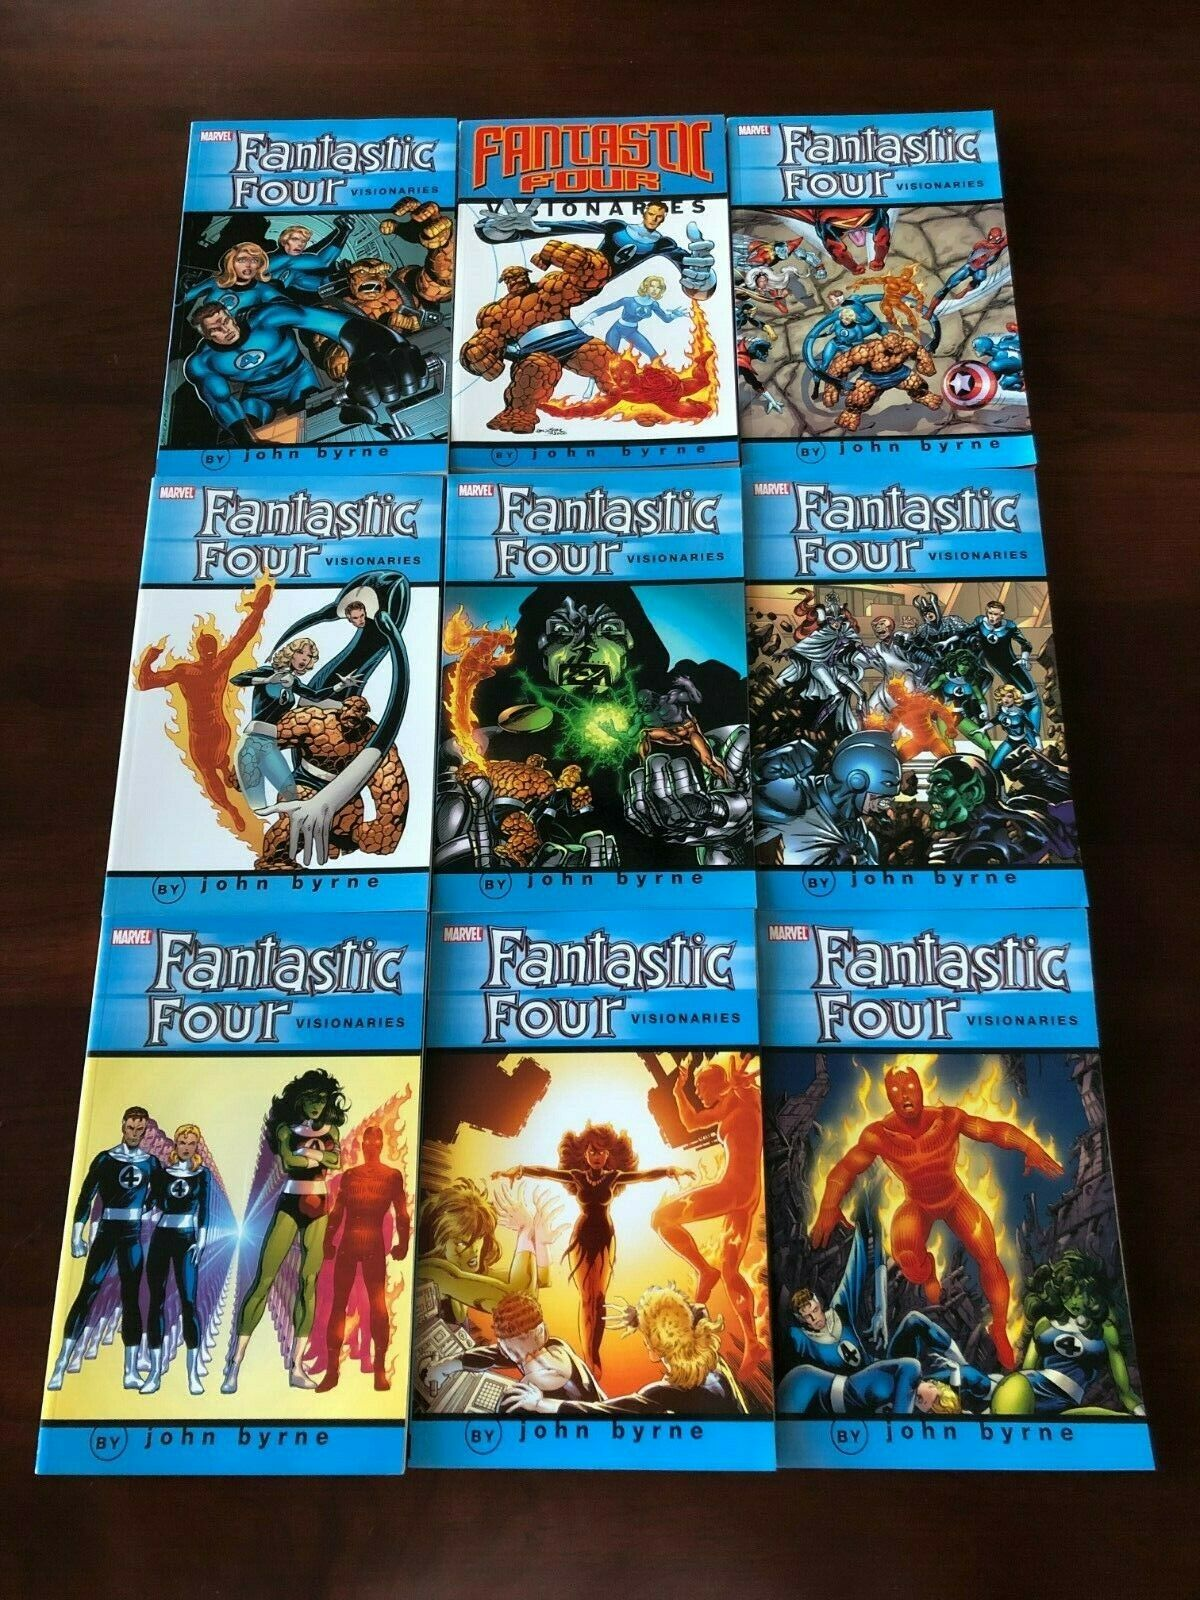 FANTASTIC FOUR VISIONARIES JOHN BYRNE COMPLETE TPB SET VOLUMES 0 1 2 3 4 5 6 7 8